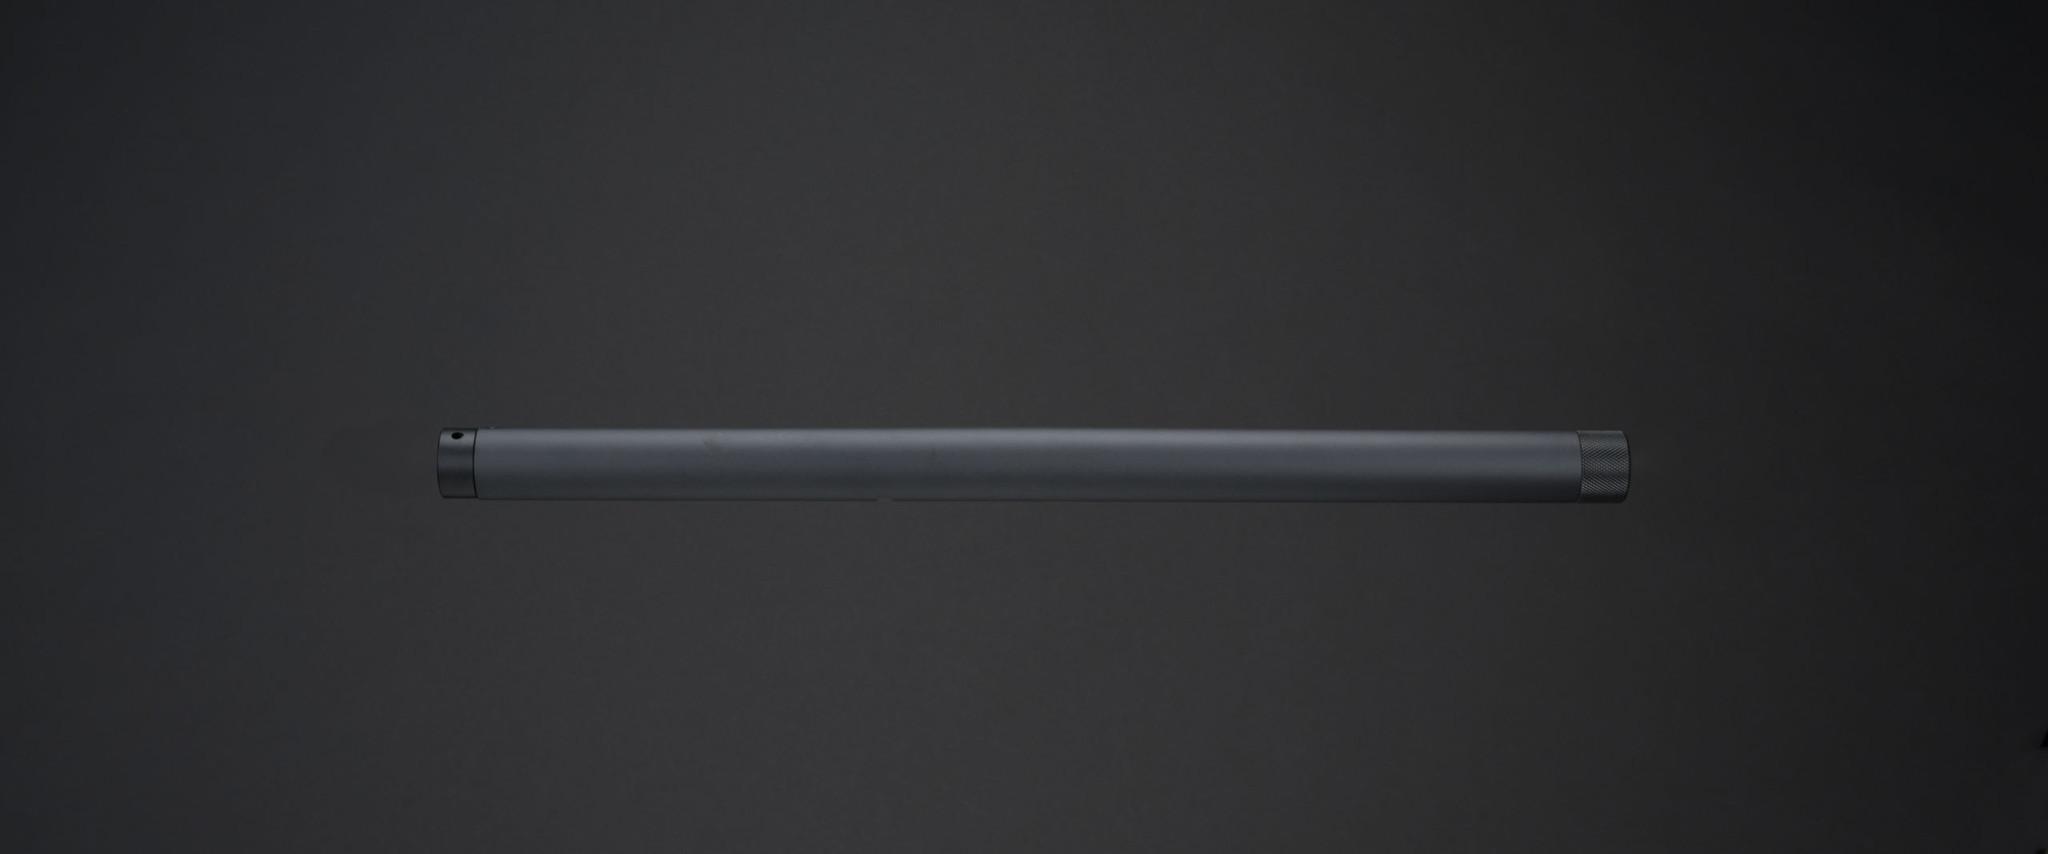 Silverback SRS 16 Inches Sport Barrel